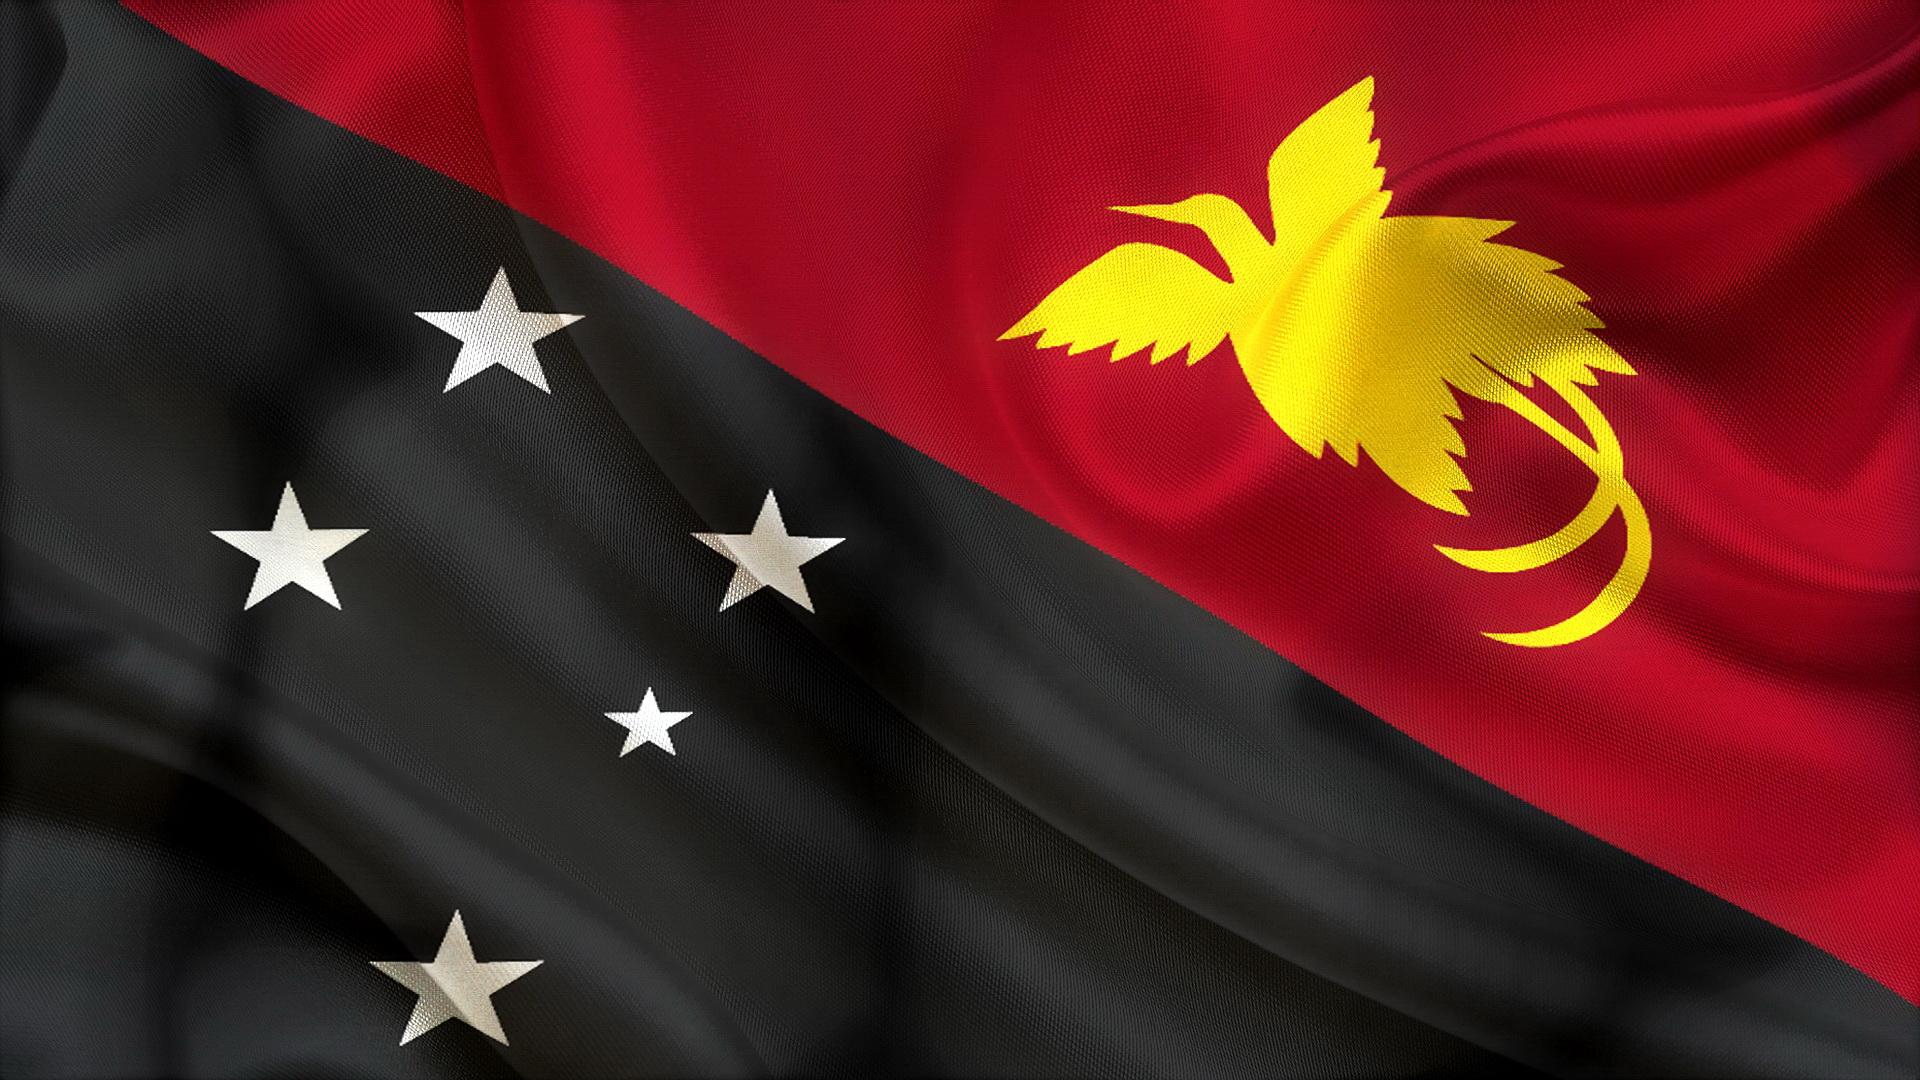 Wallpapers Papua New Guinea Flag 1920x1080 1920x1080